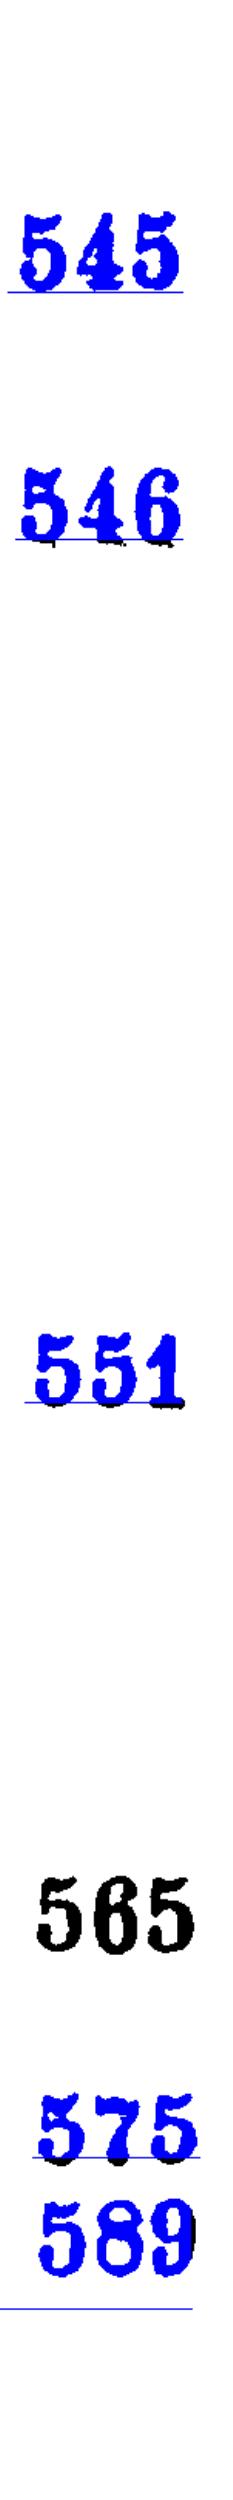 [ocr errors][ocr errors][ocr errors][ocr errors][ocr errors]